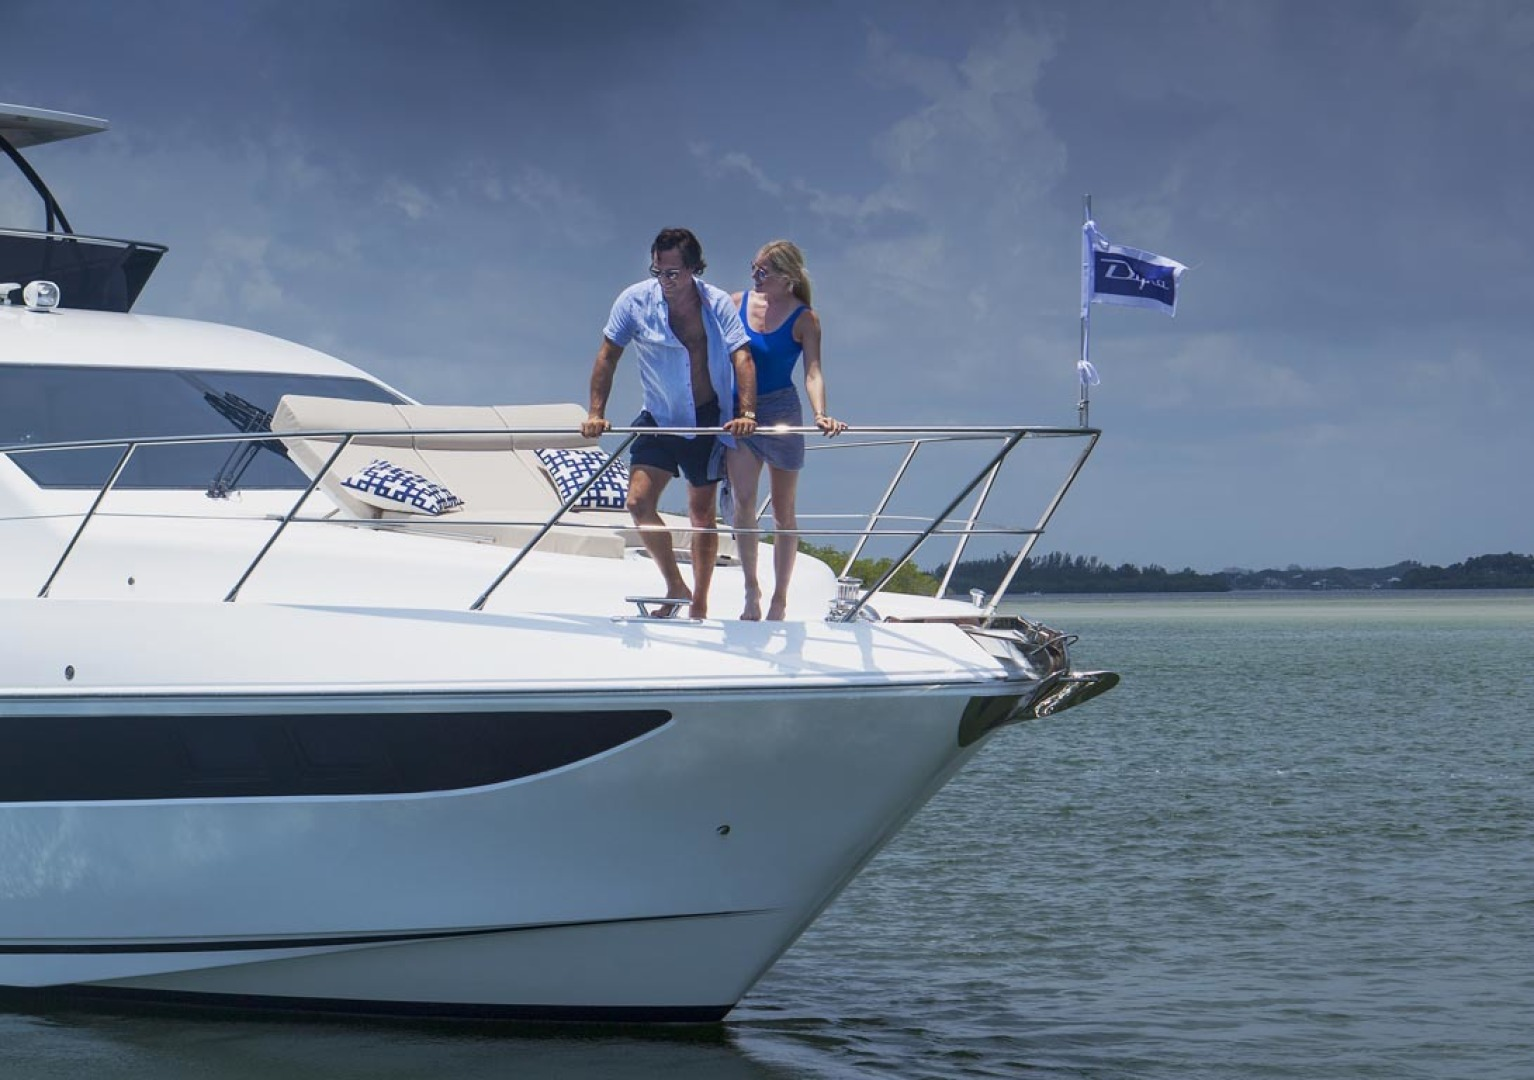 Dyna Yachts-63 2020 -Jupiter-Florida-United States-Stbd Bow Profile-1460378 | Thumbnail